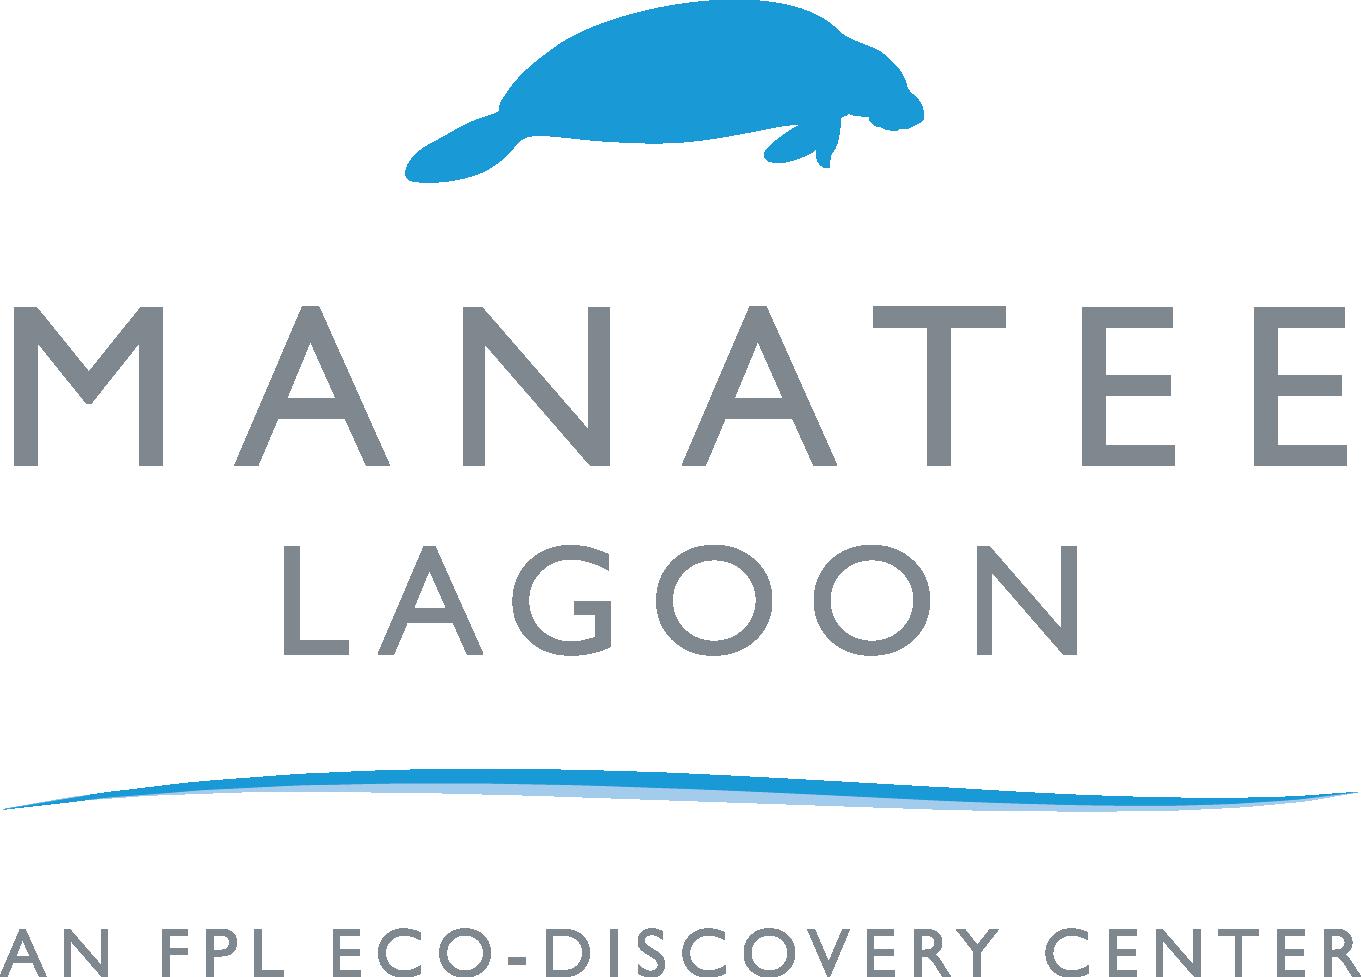 FPL Manatee Lagoon logo